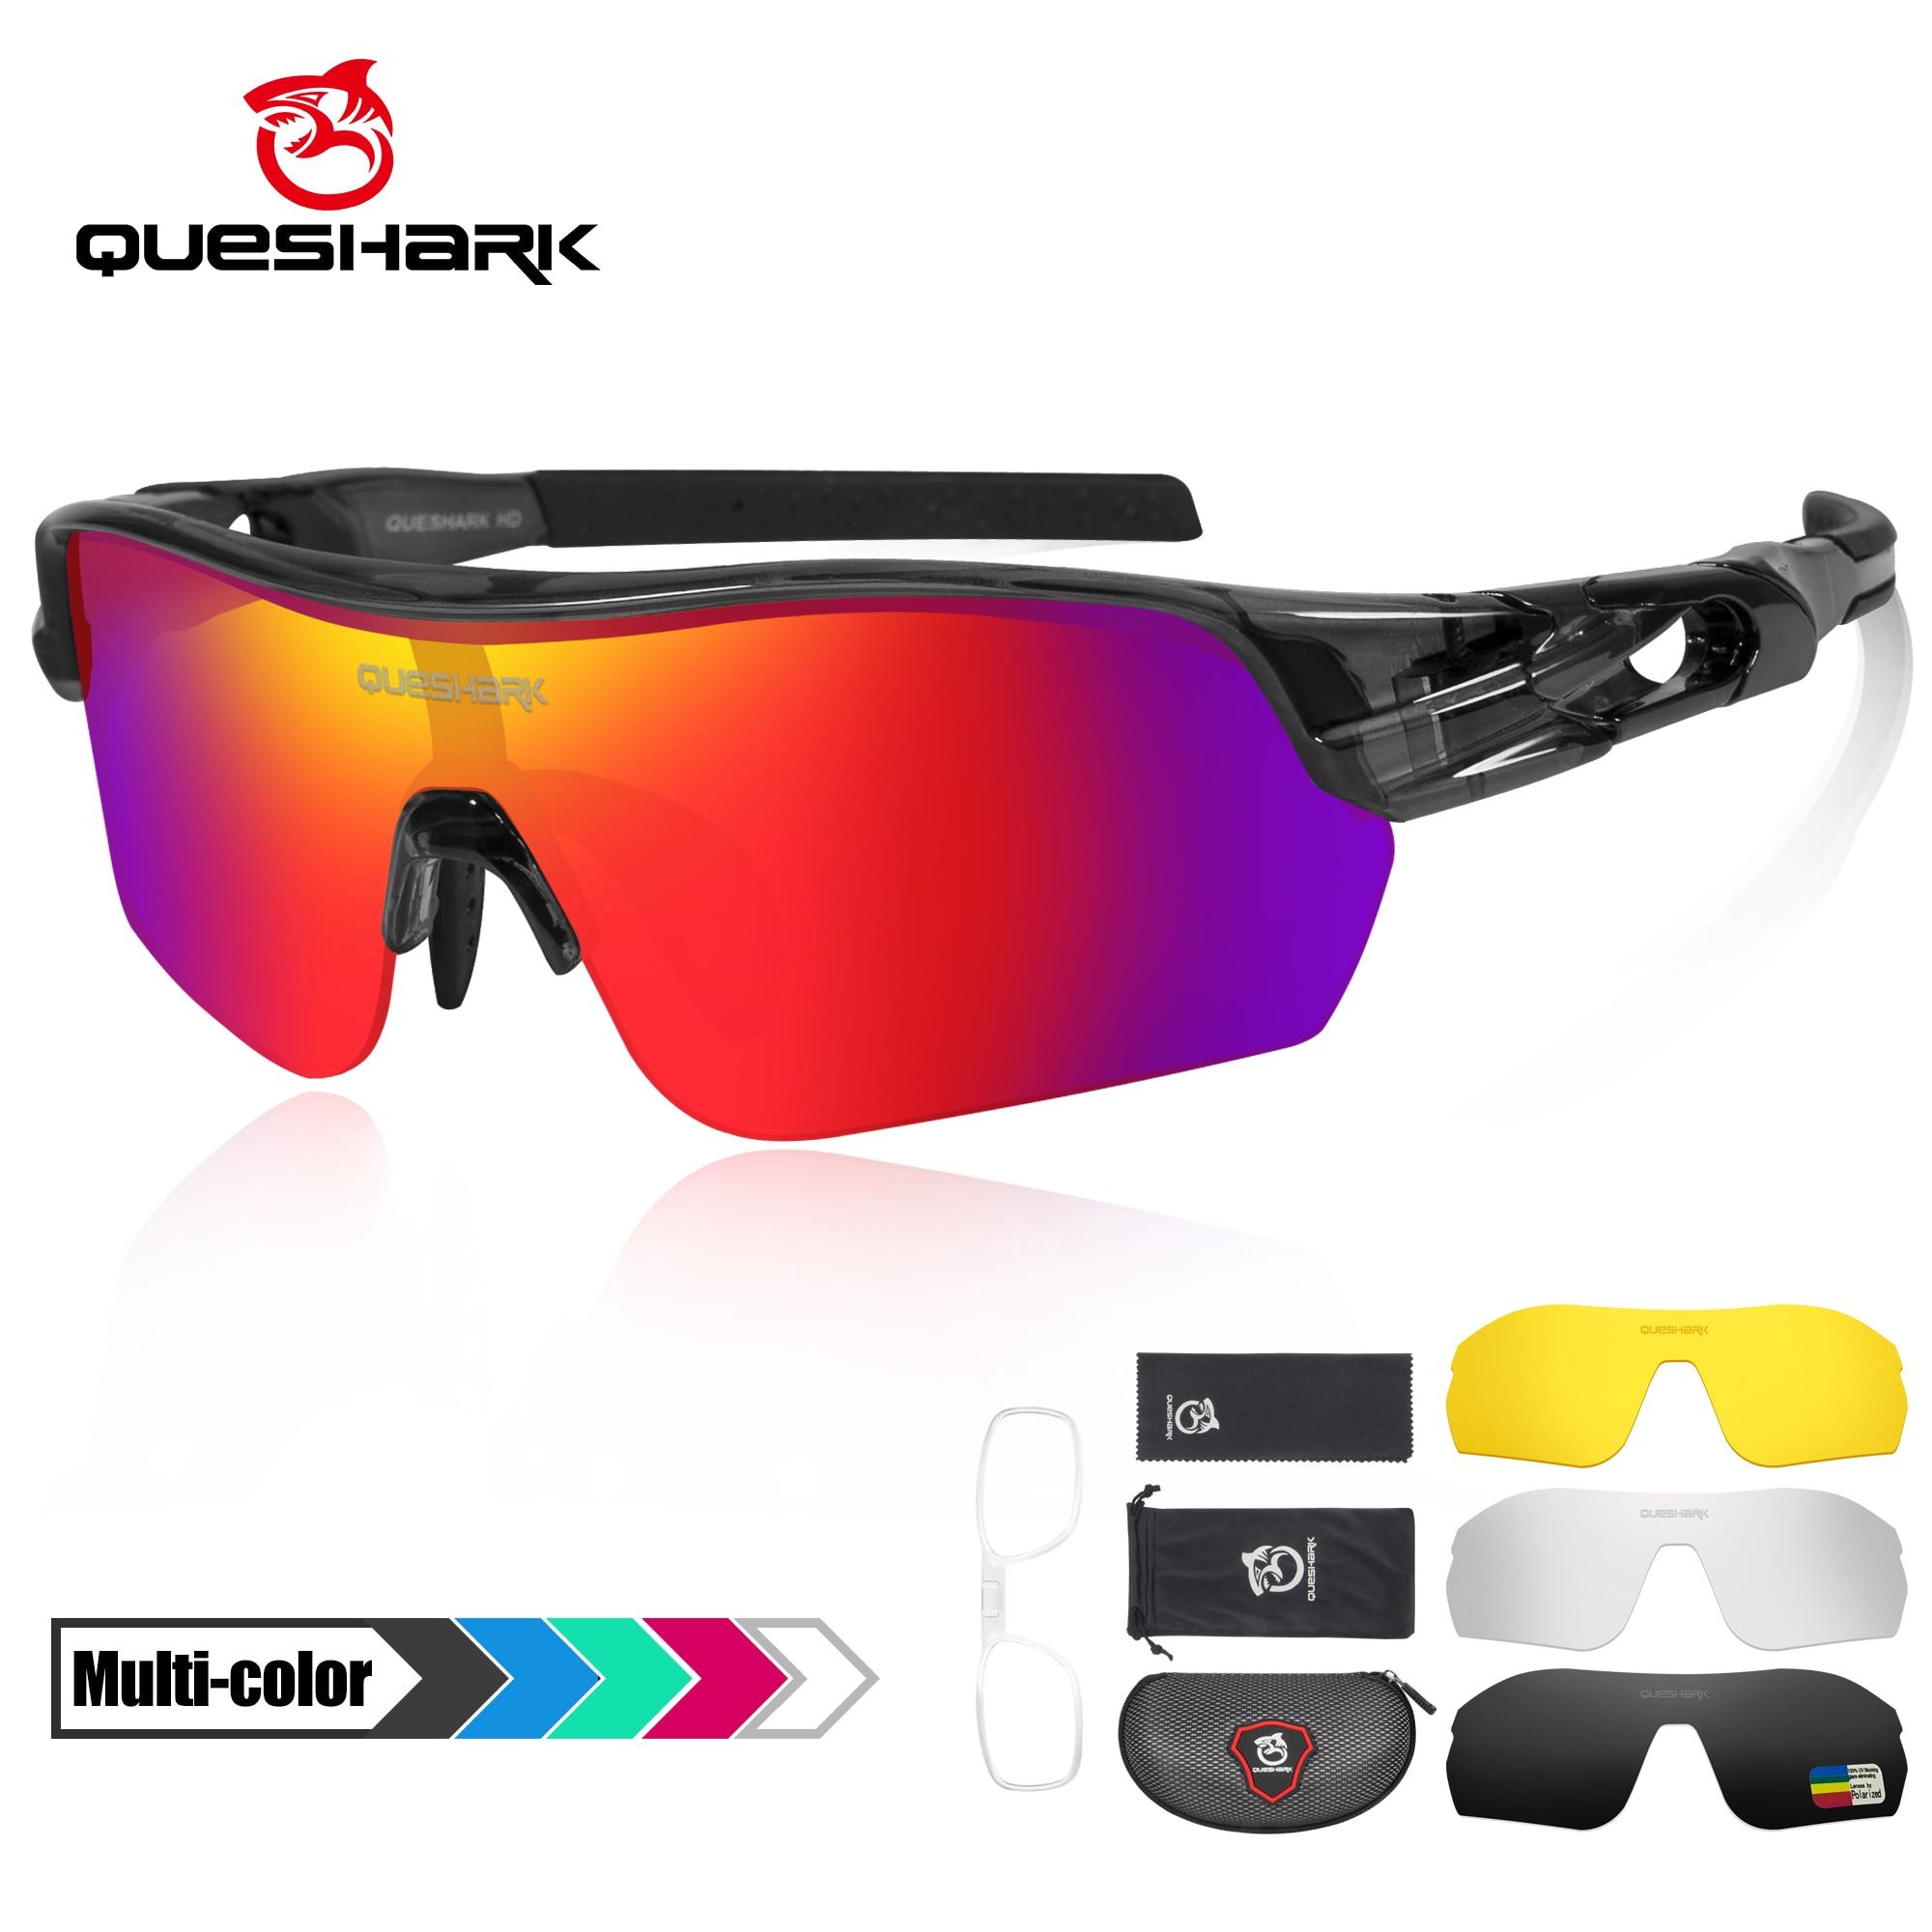 Queshark 2020 New Design Polarized Sport Sunglasses For Men Women Cycling Running Fishing Driving Golf 4 HD Lens Exchangeable